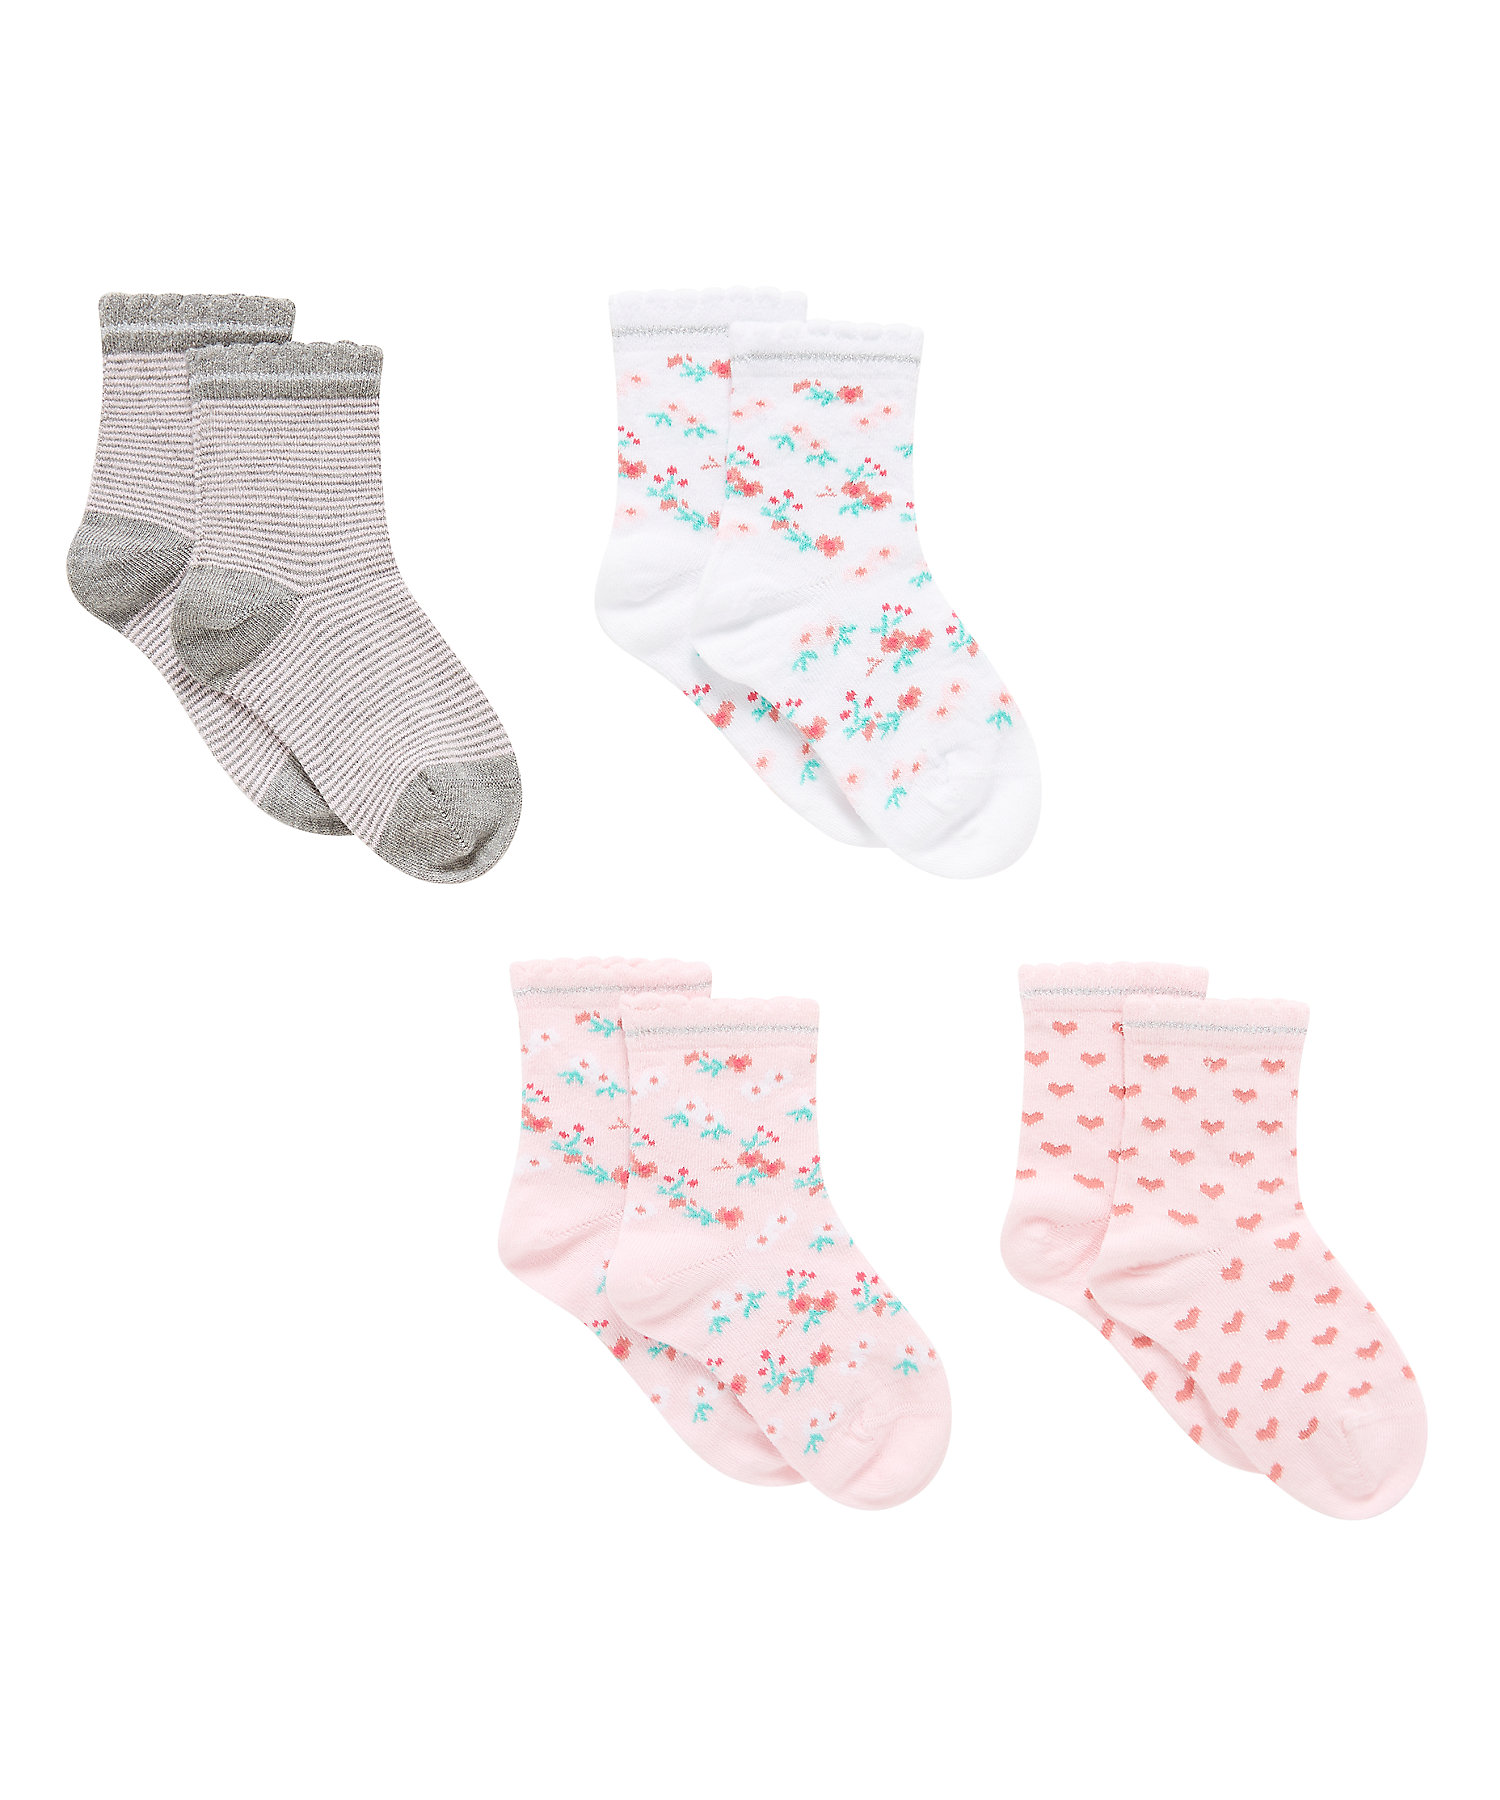 Mothercare | Girls  Socks Floral Design - Pack Of 4 - Multicolor